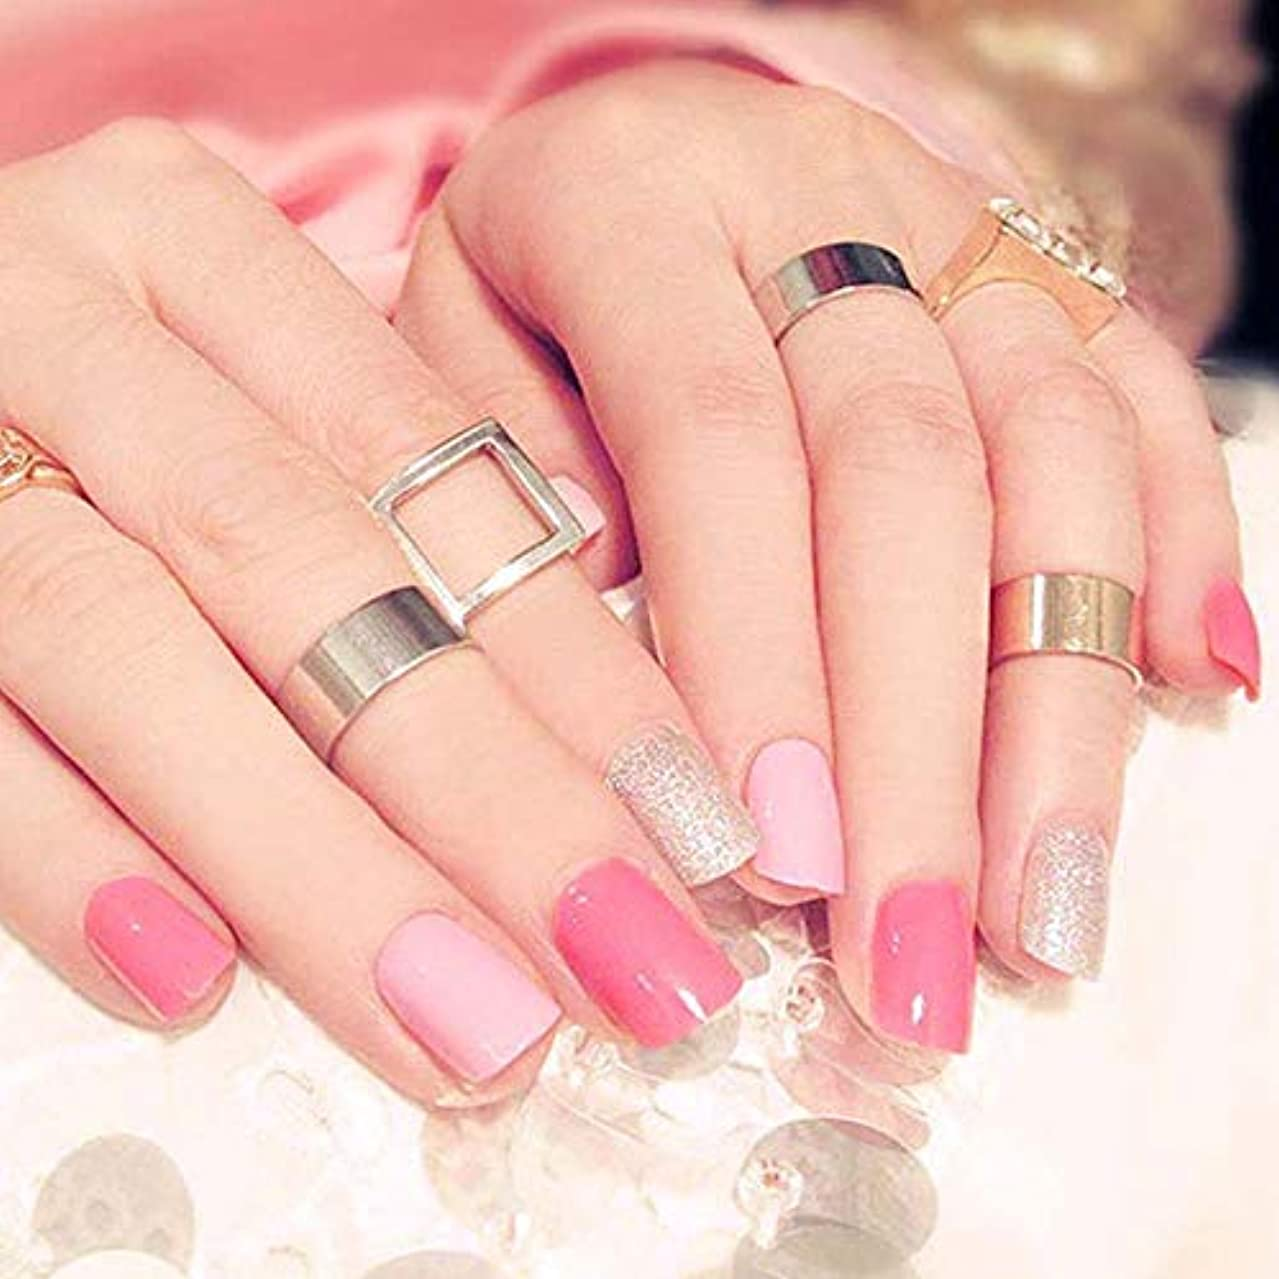 XUTXZKA 24ピースピンク色偽爪女性きらめきグリッターネイルアートのヒント短いサイズフルカバービルド爪